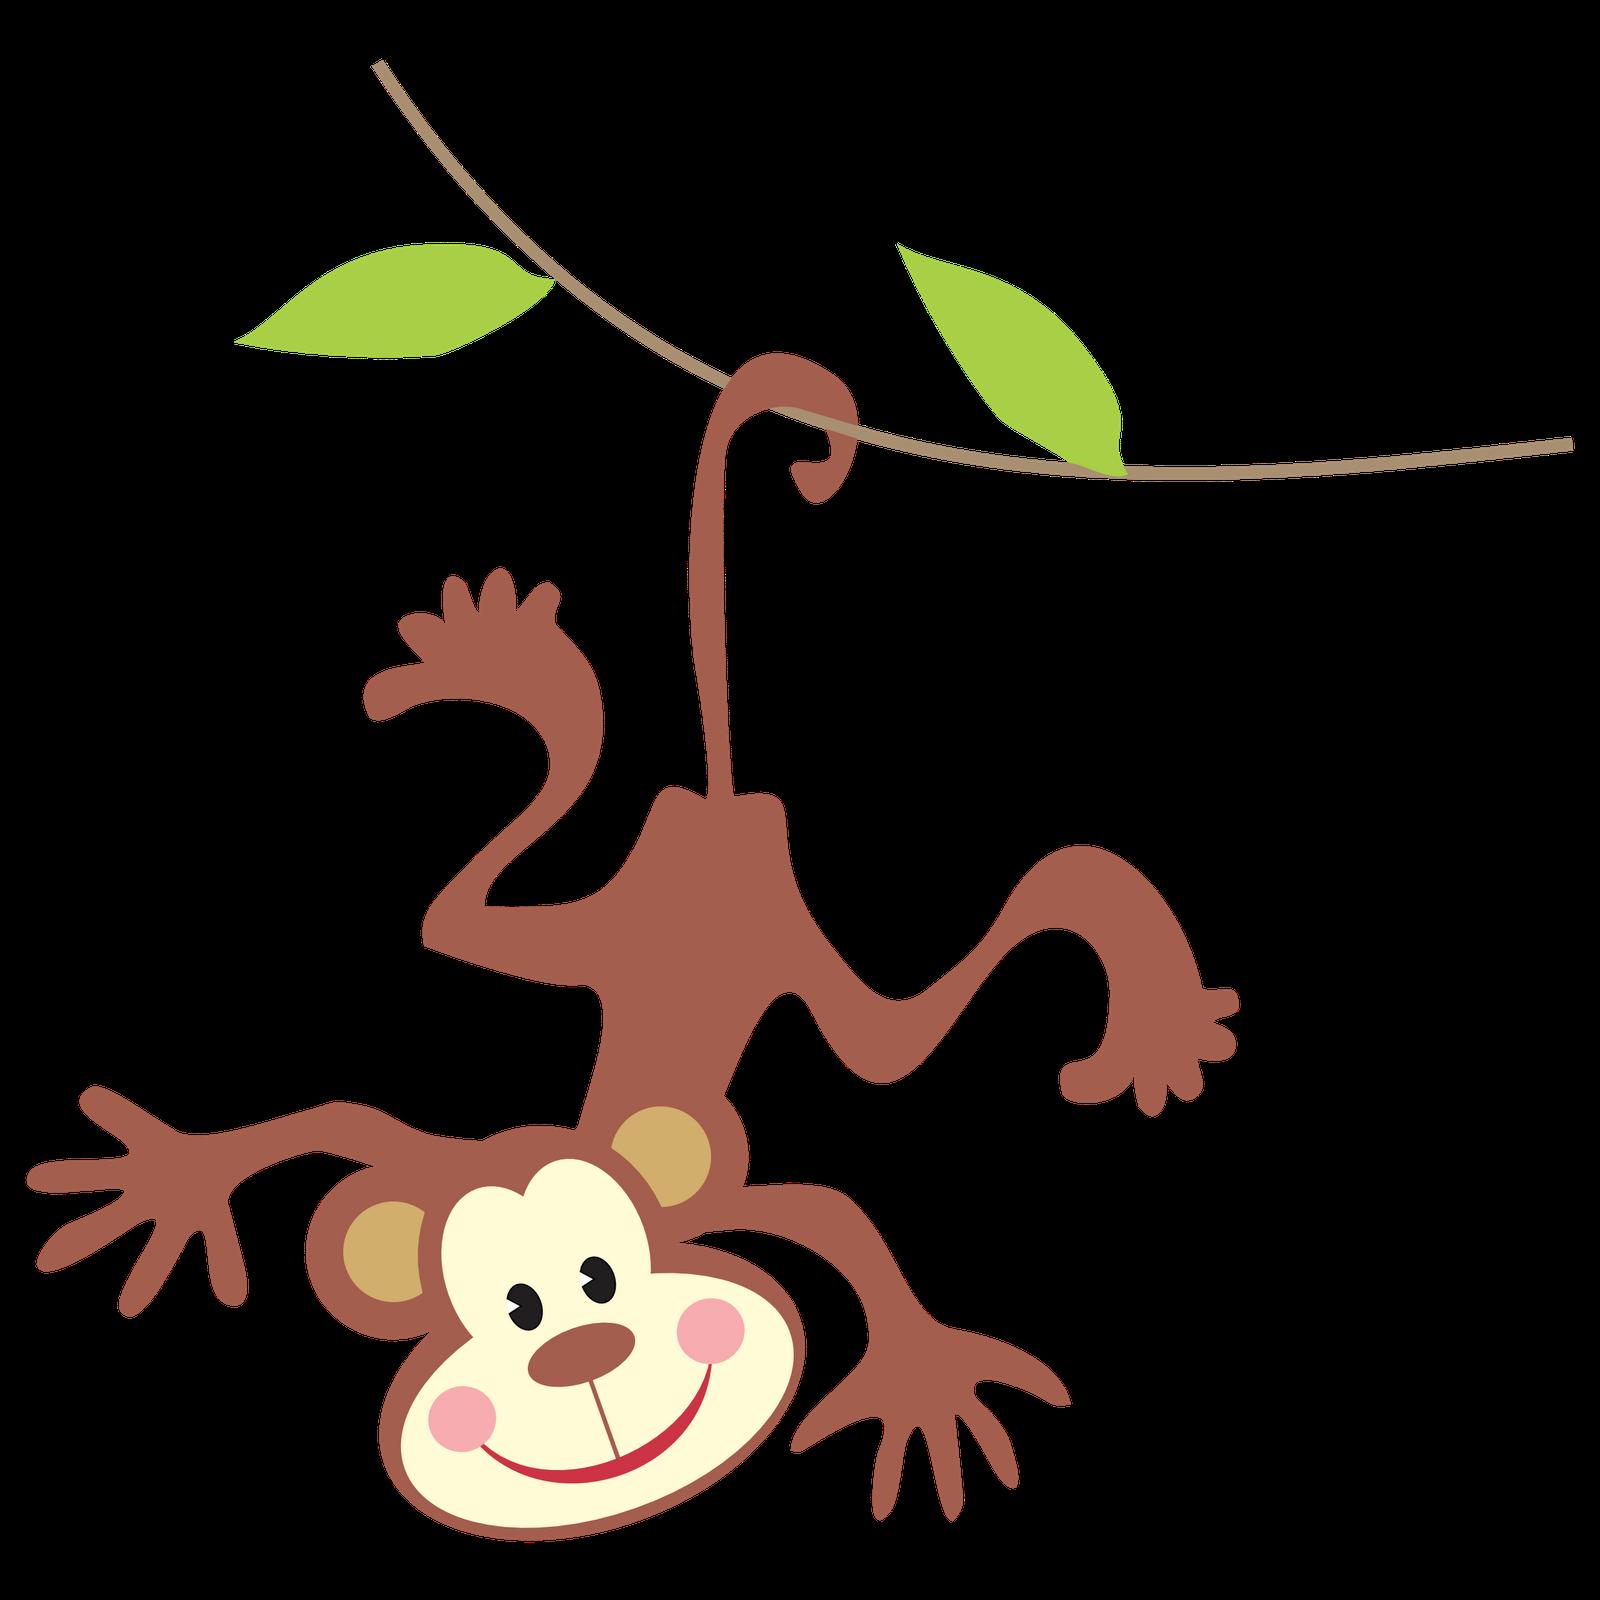 1600x1600 Free Monkey Clip Art Clipart Panda